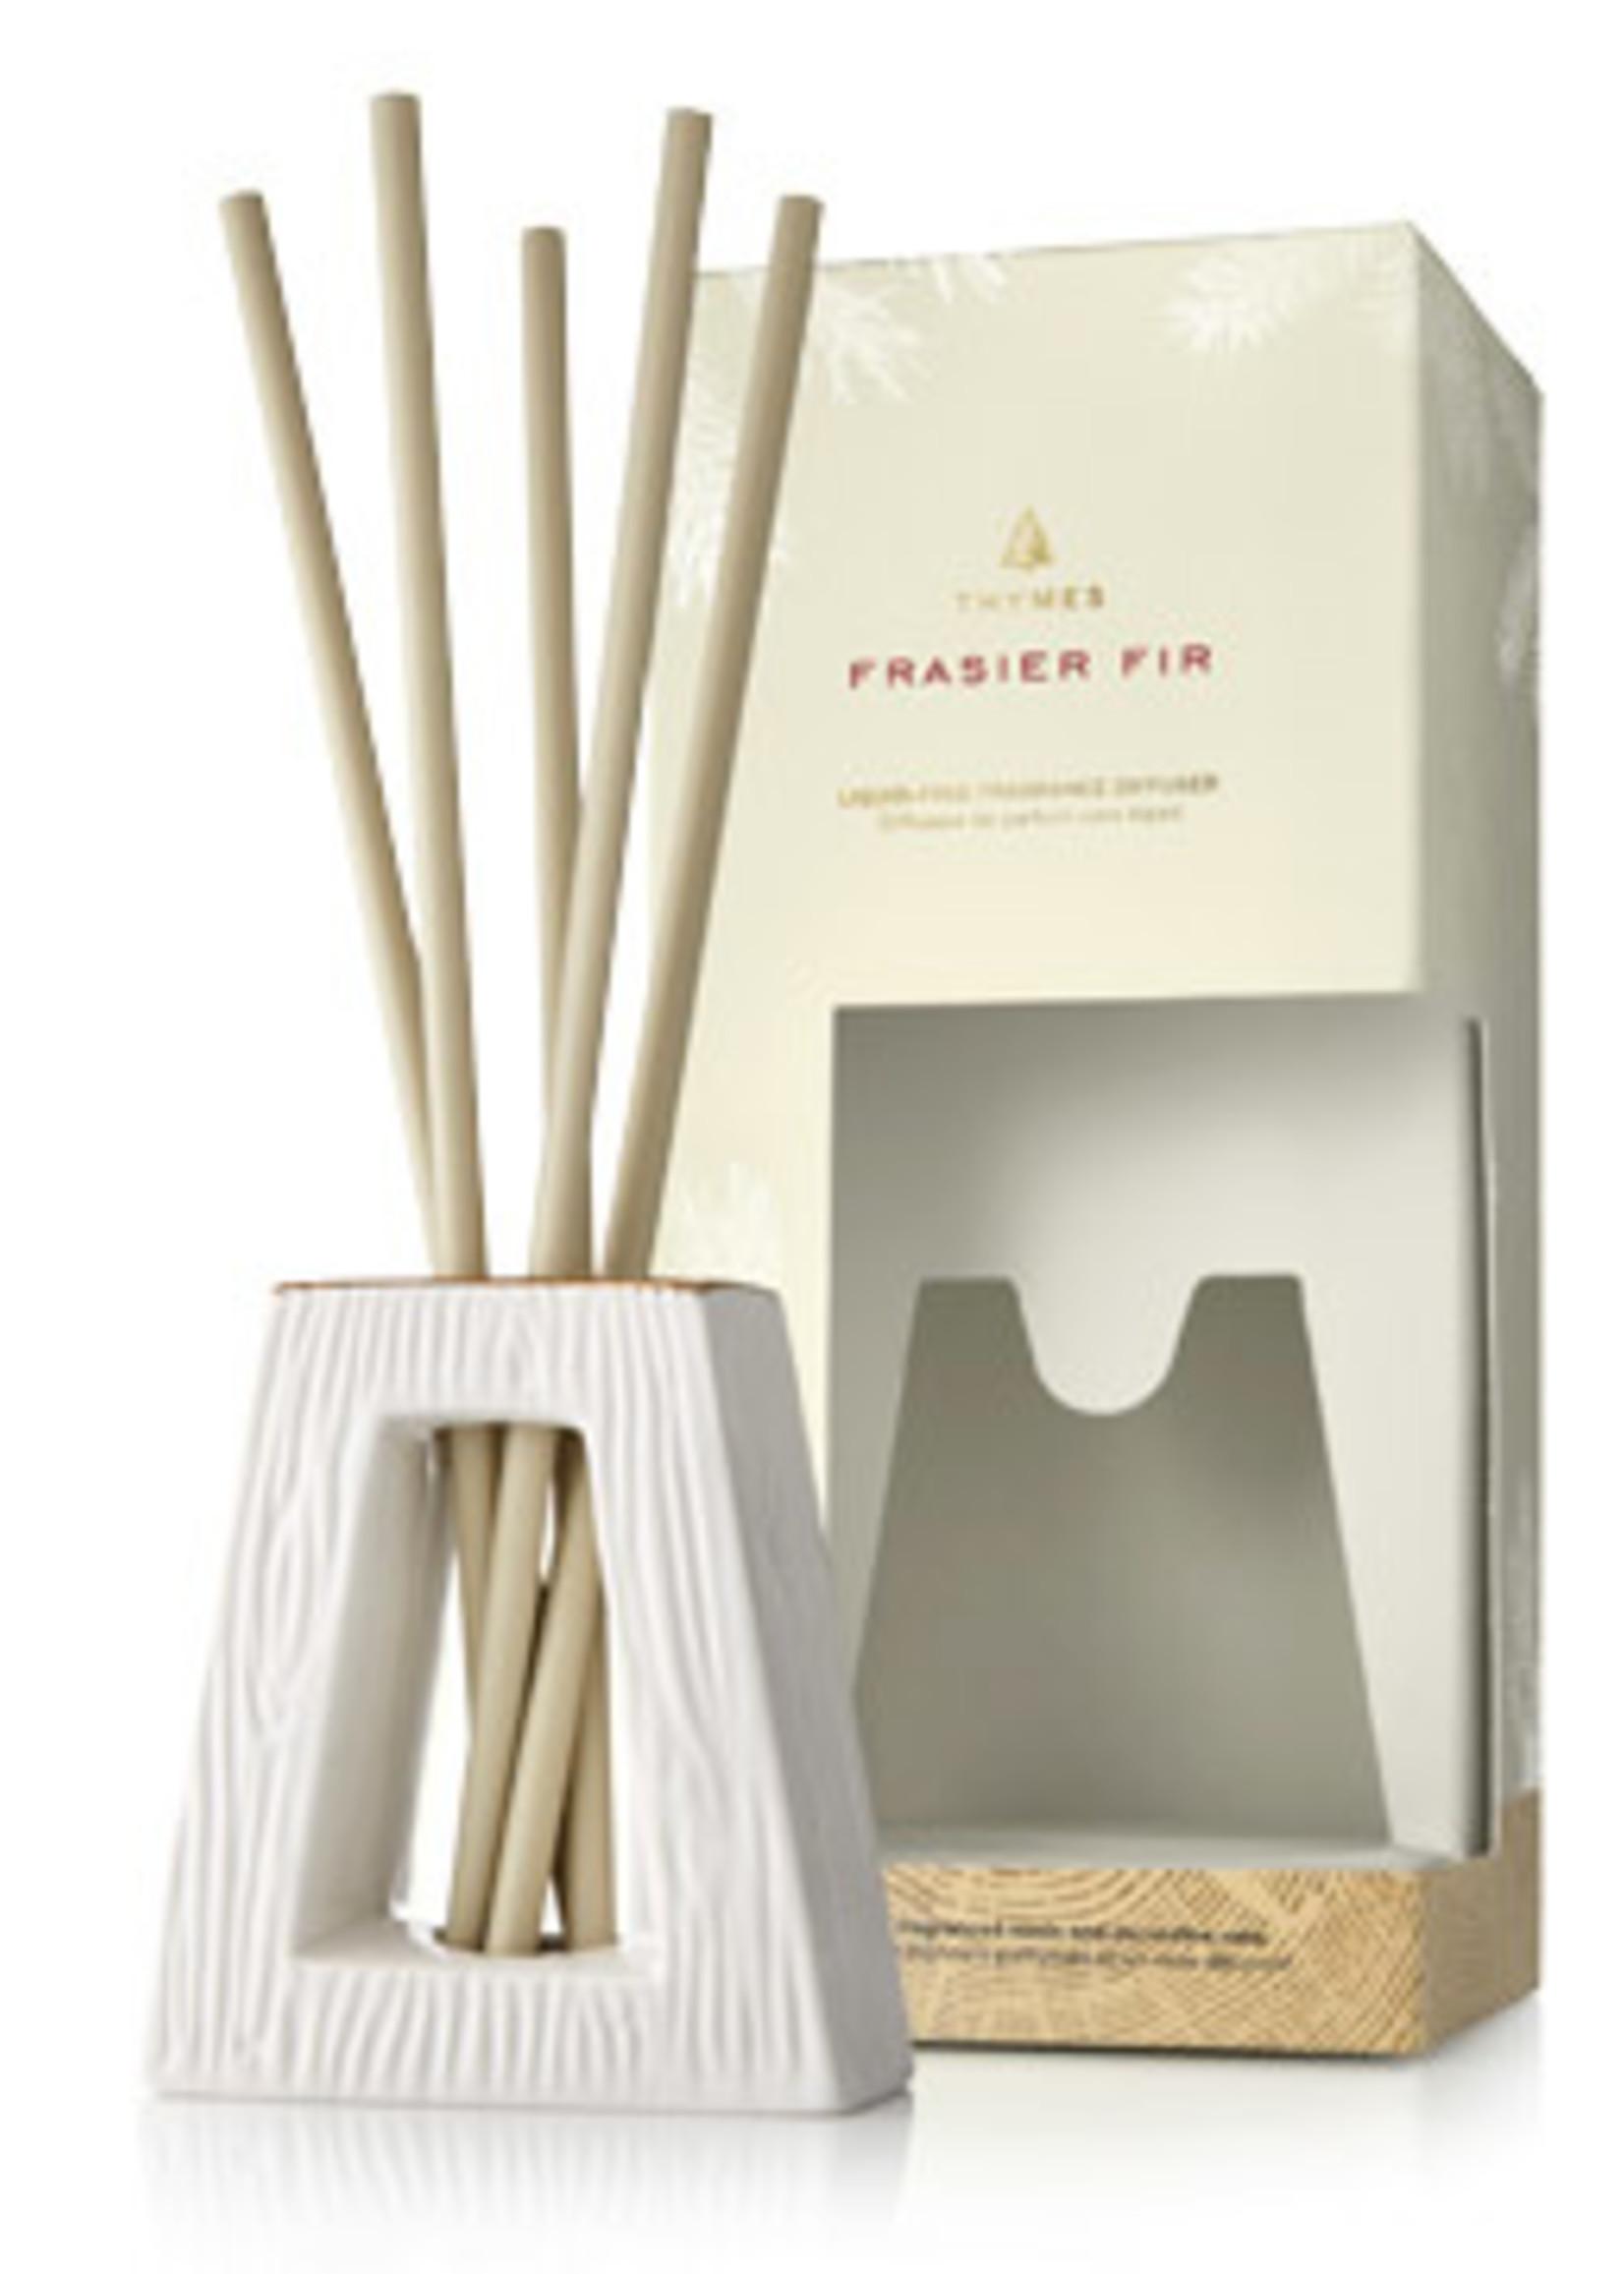 Thymes Frasier Fir Gilded Liquid-free Fragrance Diffuser